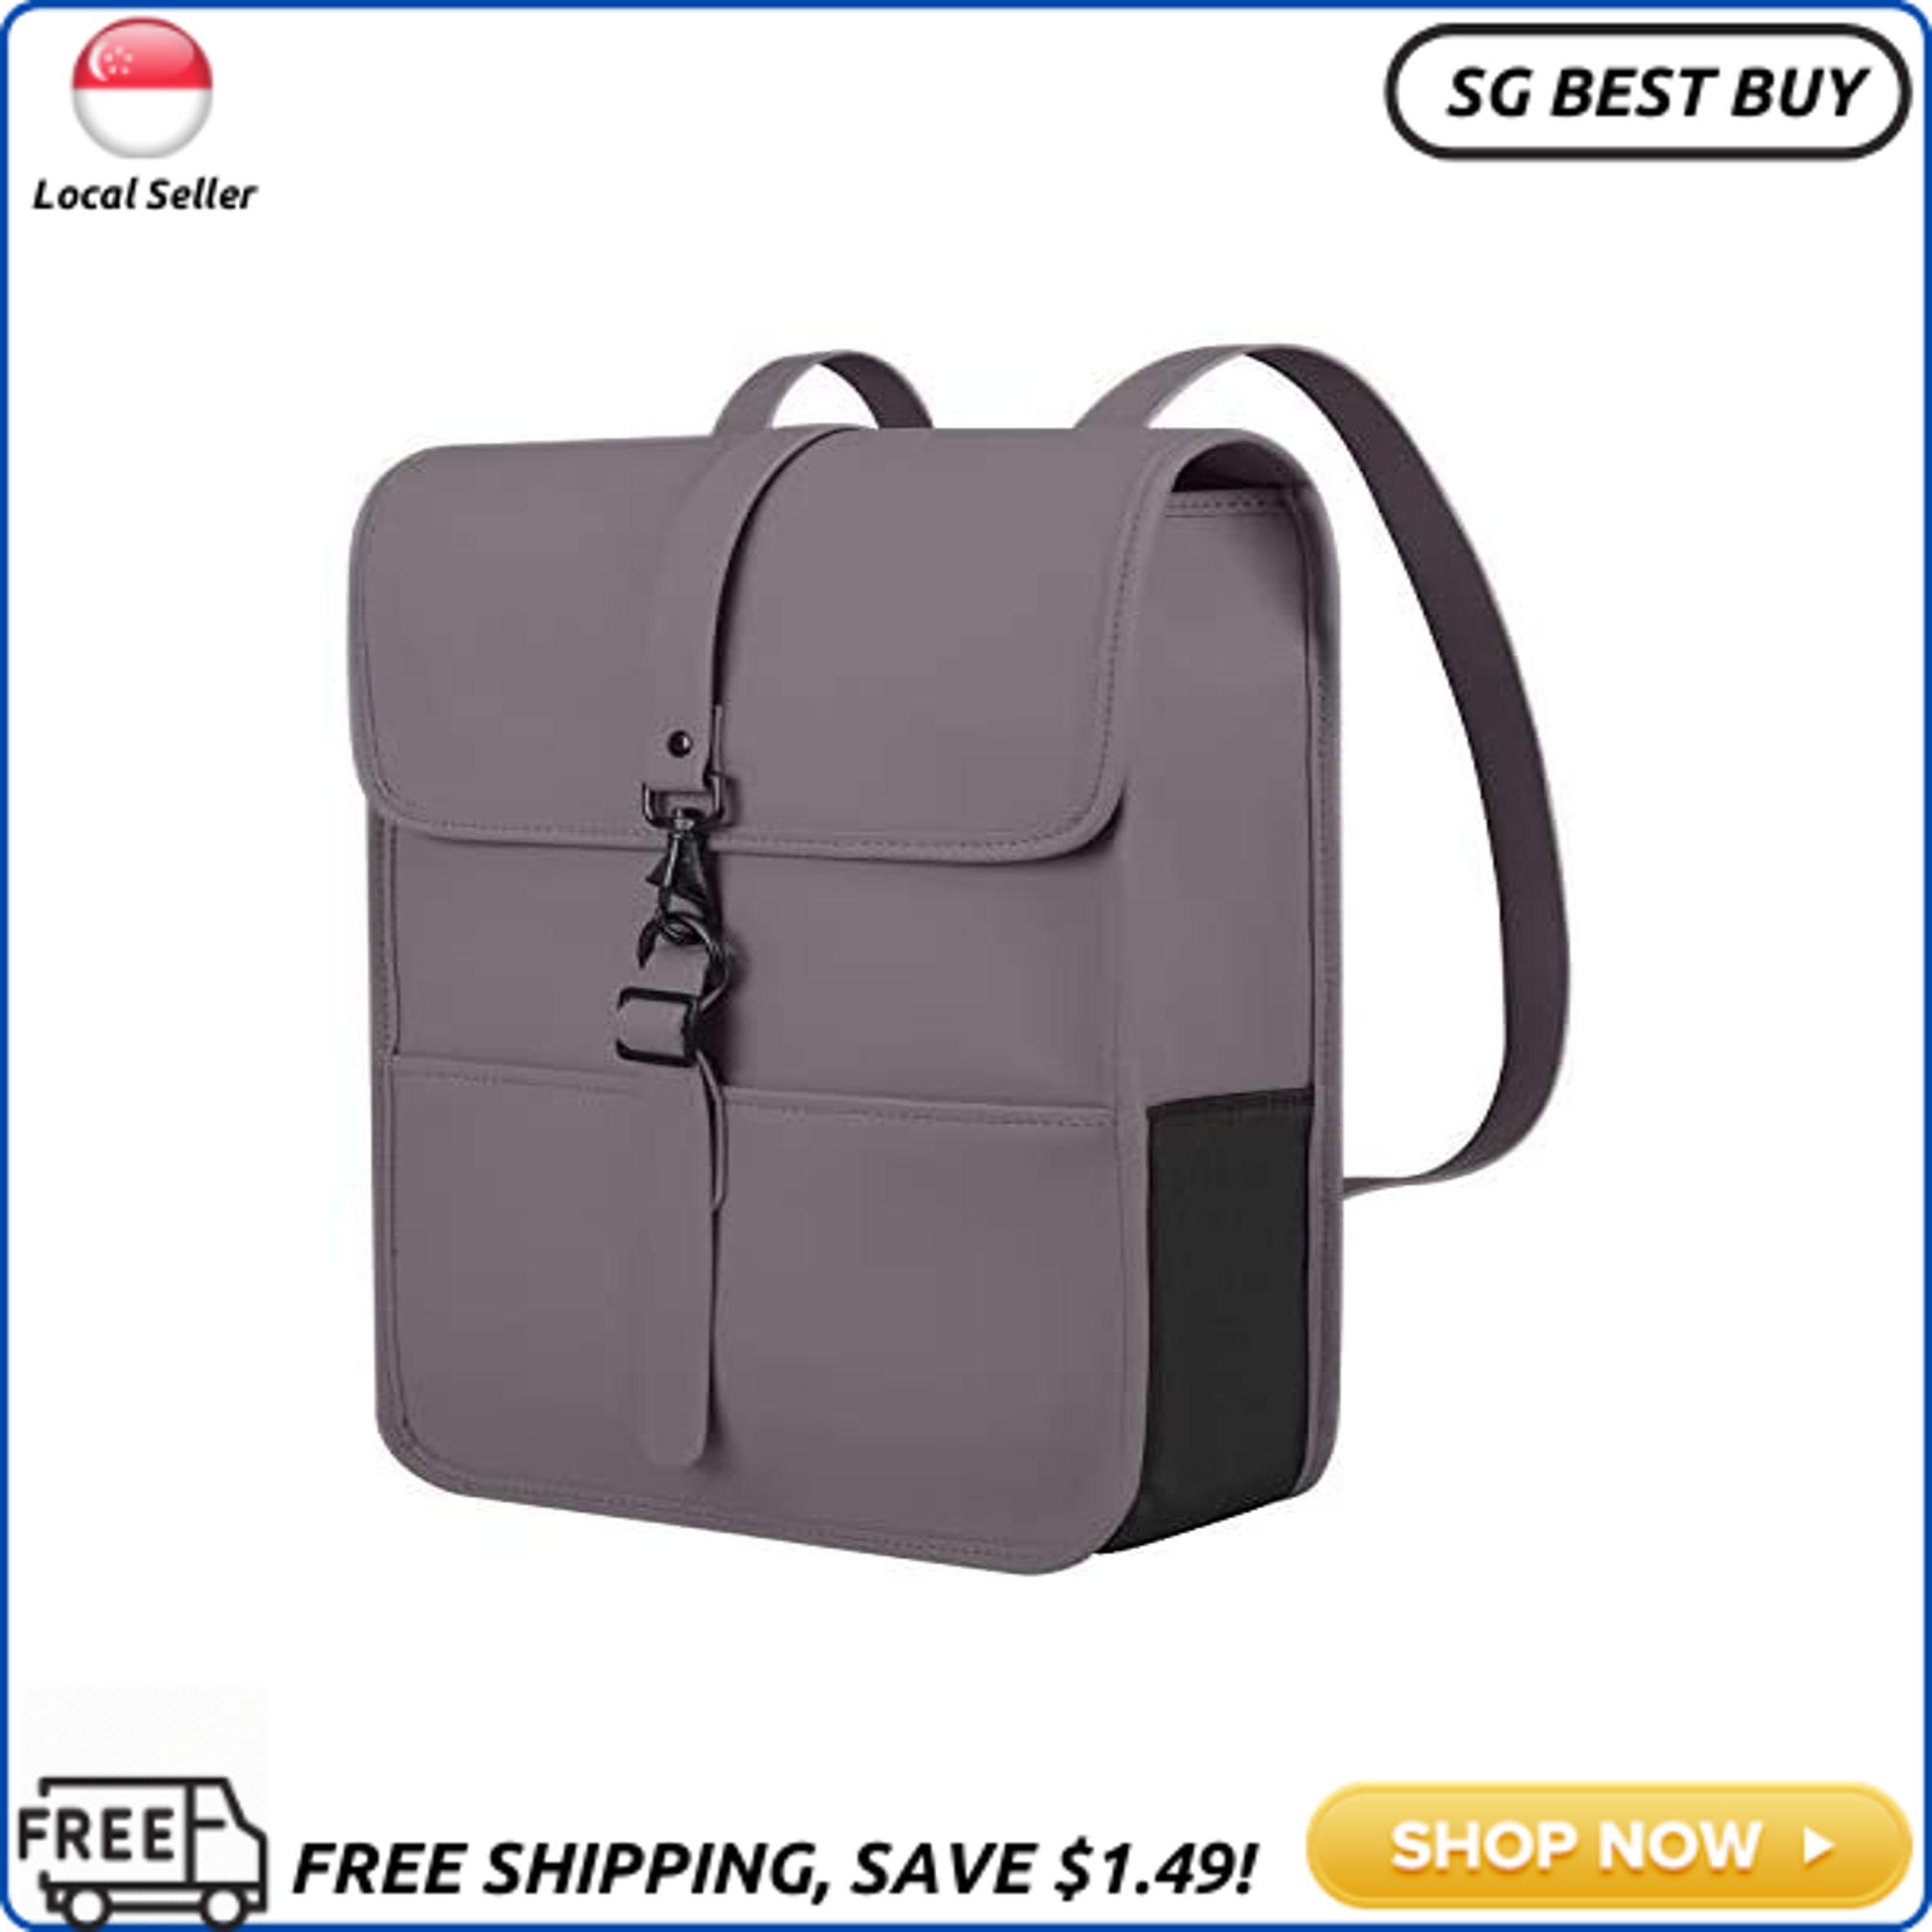 (SG SELLER) Cartinoe Women Backpack PU Leather Waterproof Backpack School College Bookbag Laptop Backpack Travel Bag Large Capacity Casual Vintage Daypacks Satchel Messenger Bag for 14 15.6 Inch Notebook - Grey